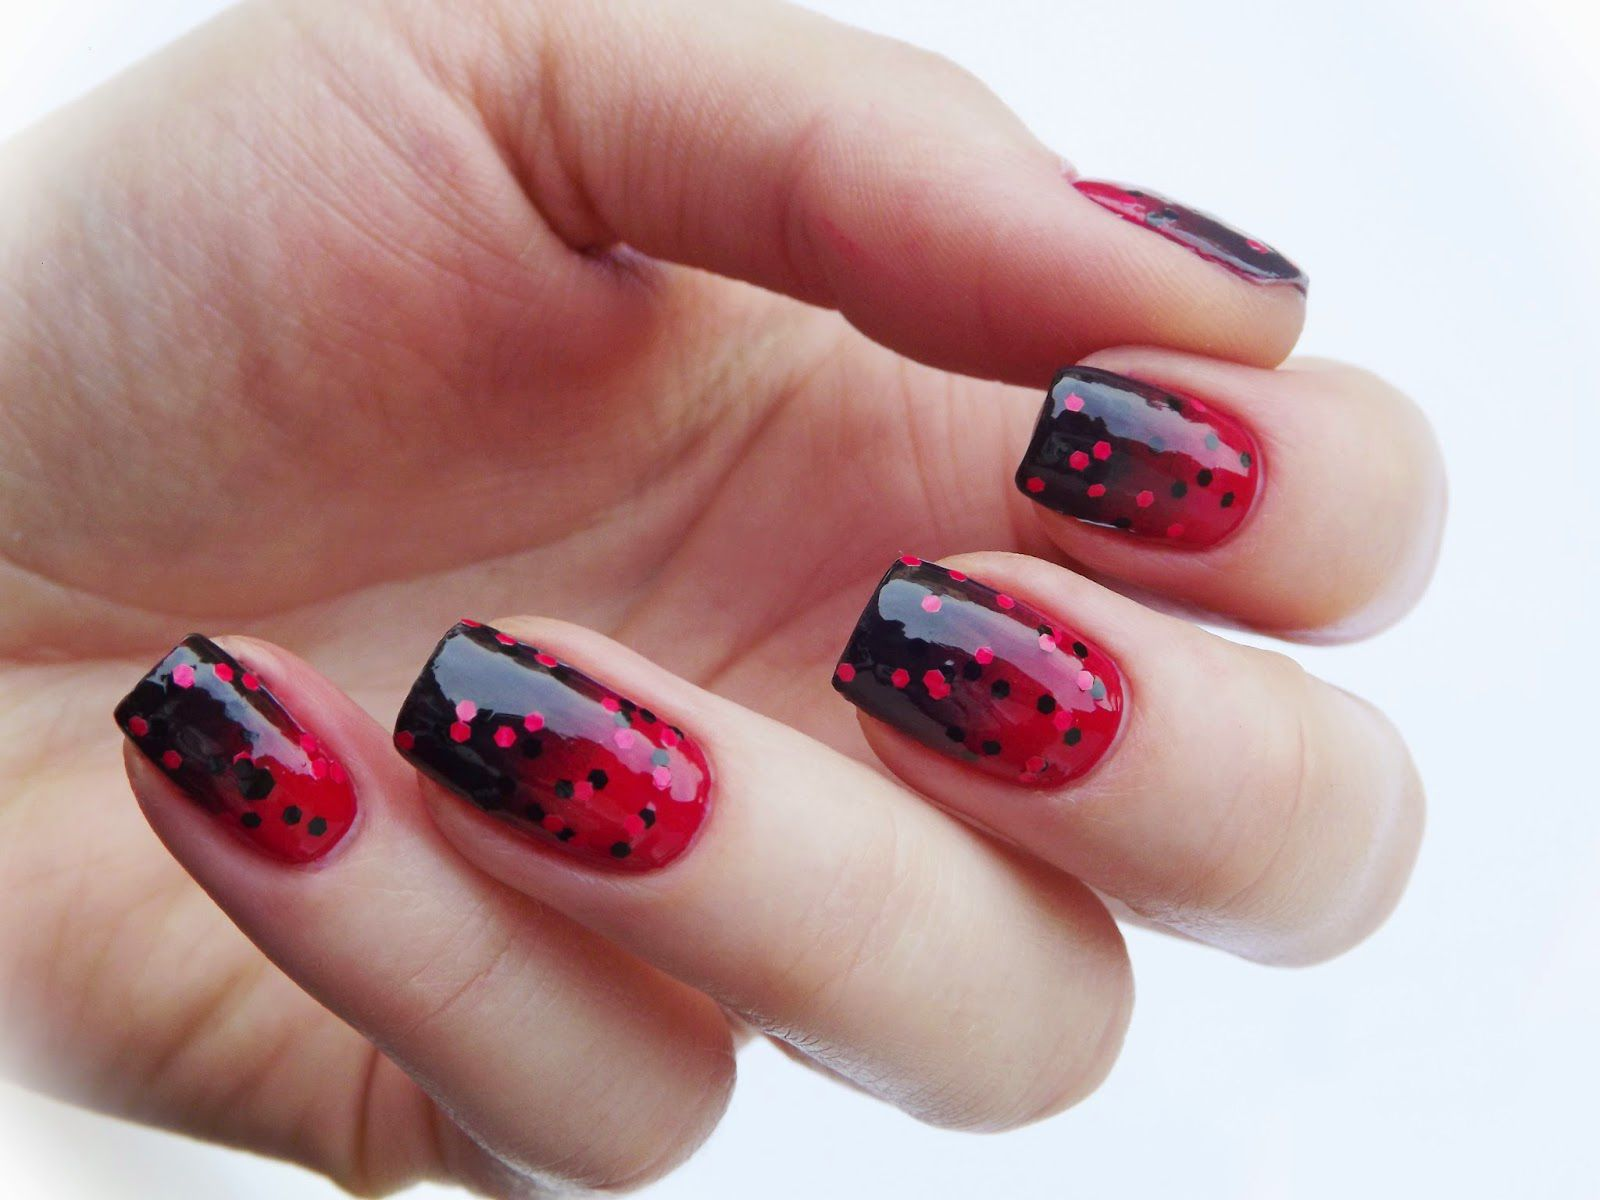 Uñas de color rojo con glitter de color negro   NailsNAILSNaILS ...